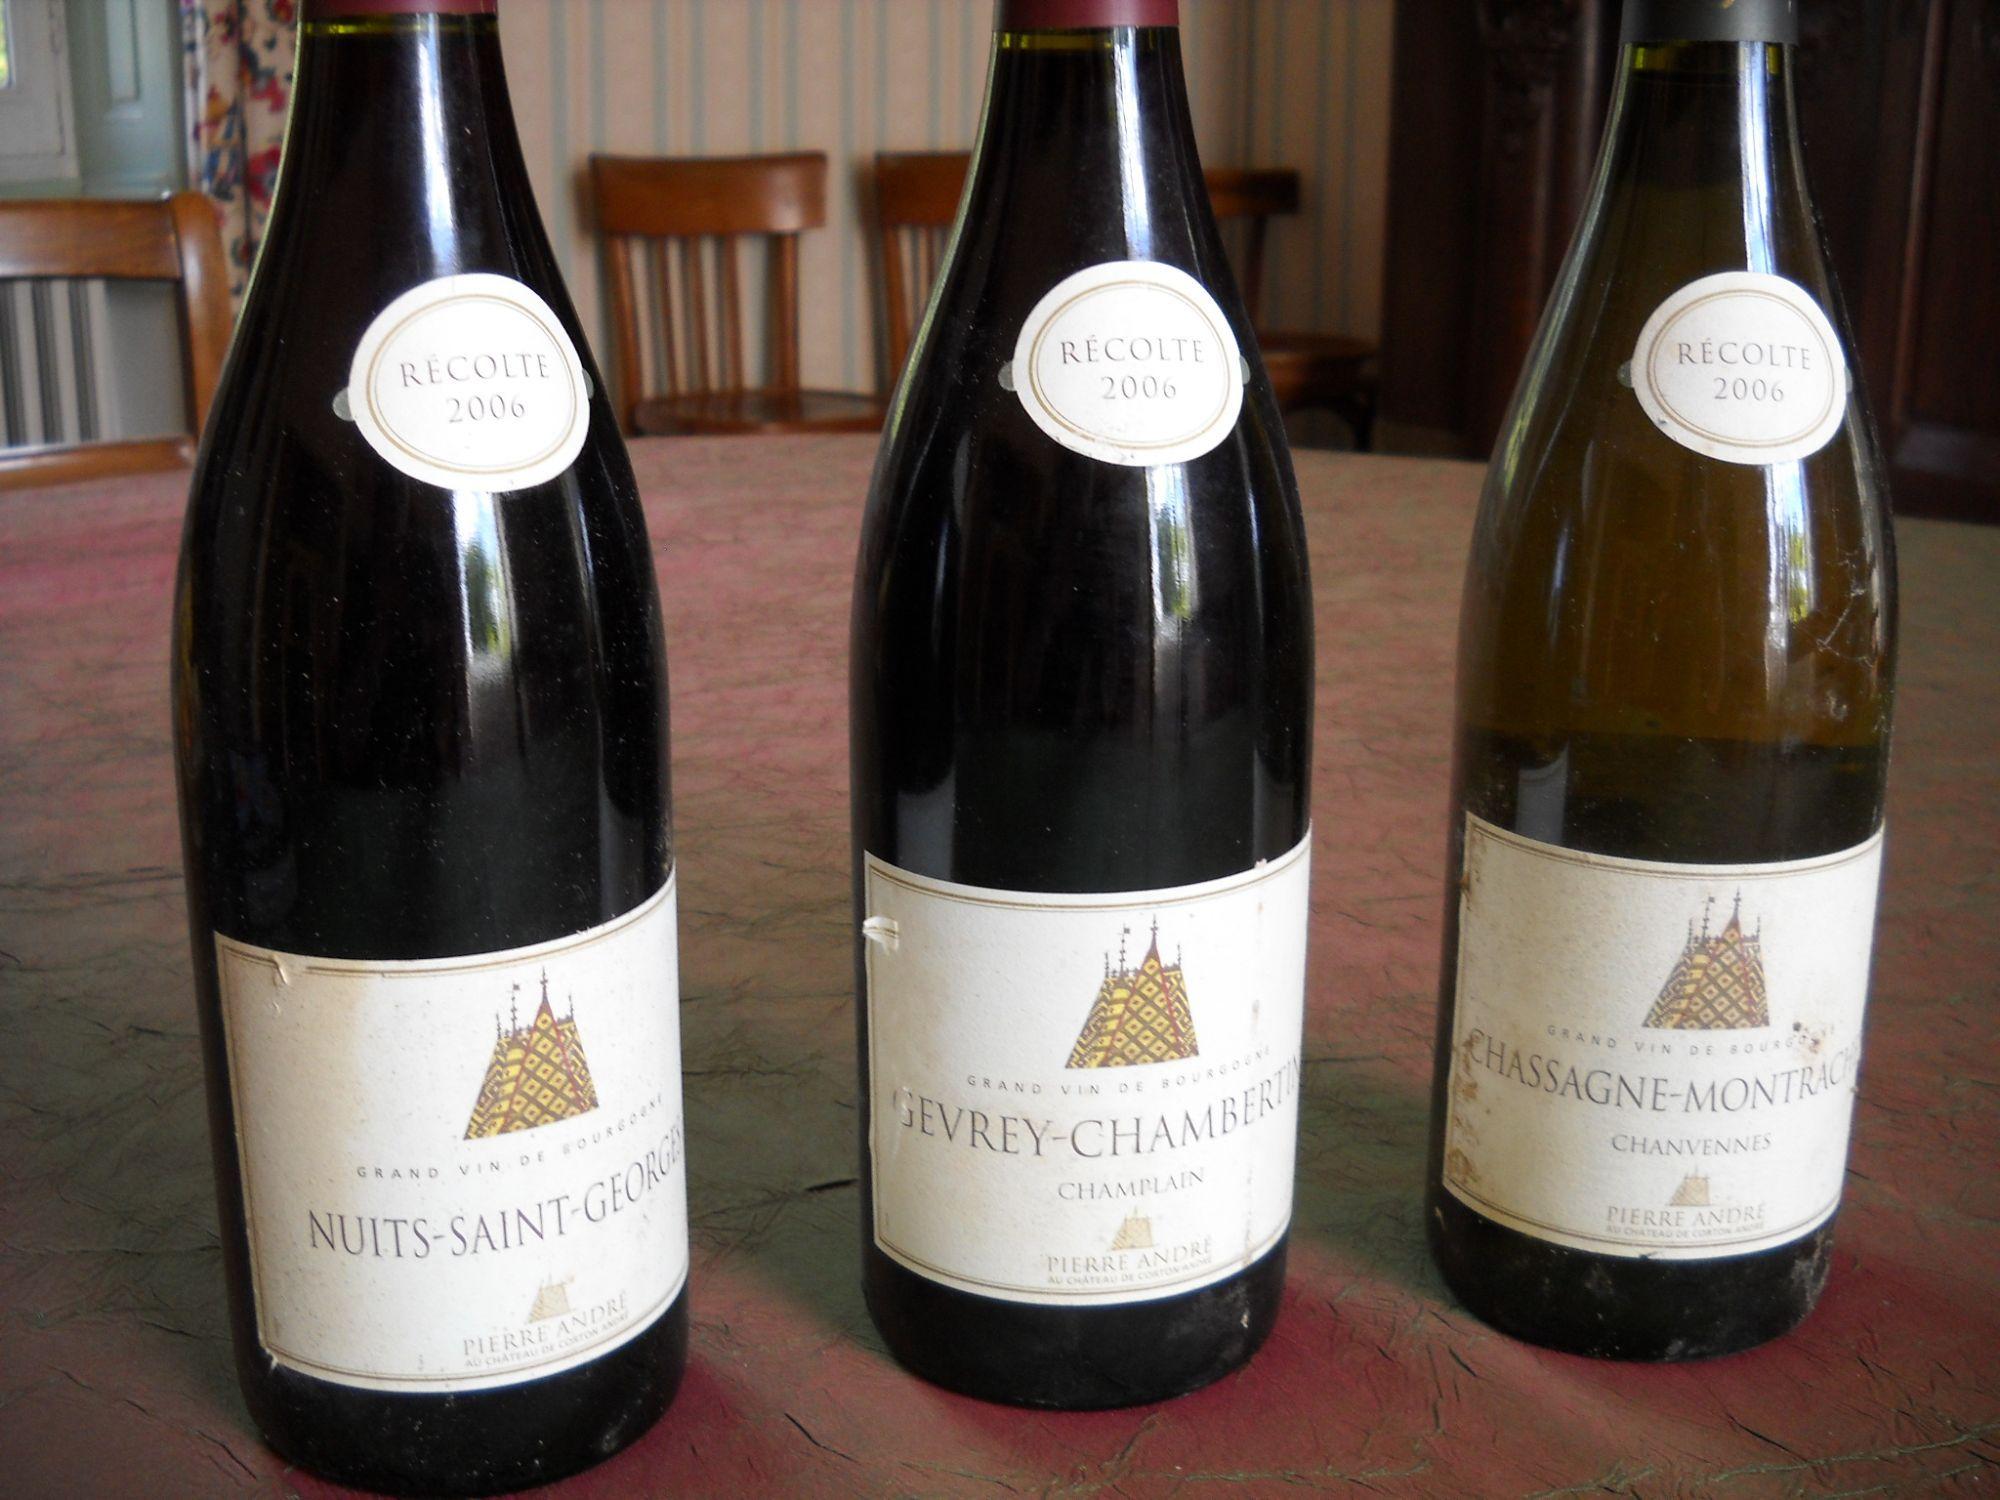 Bourgogne Rouge Gevrey Chambertin Nuit Saint Georges Chassagne Montrachet Wine Bottle Wine Wines